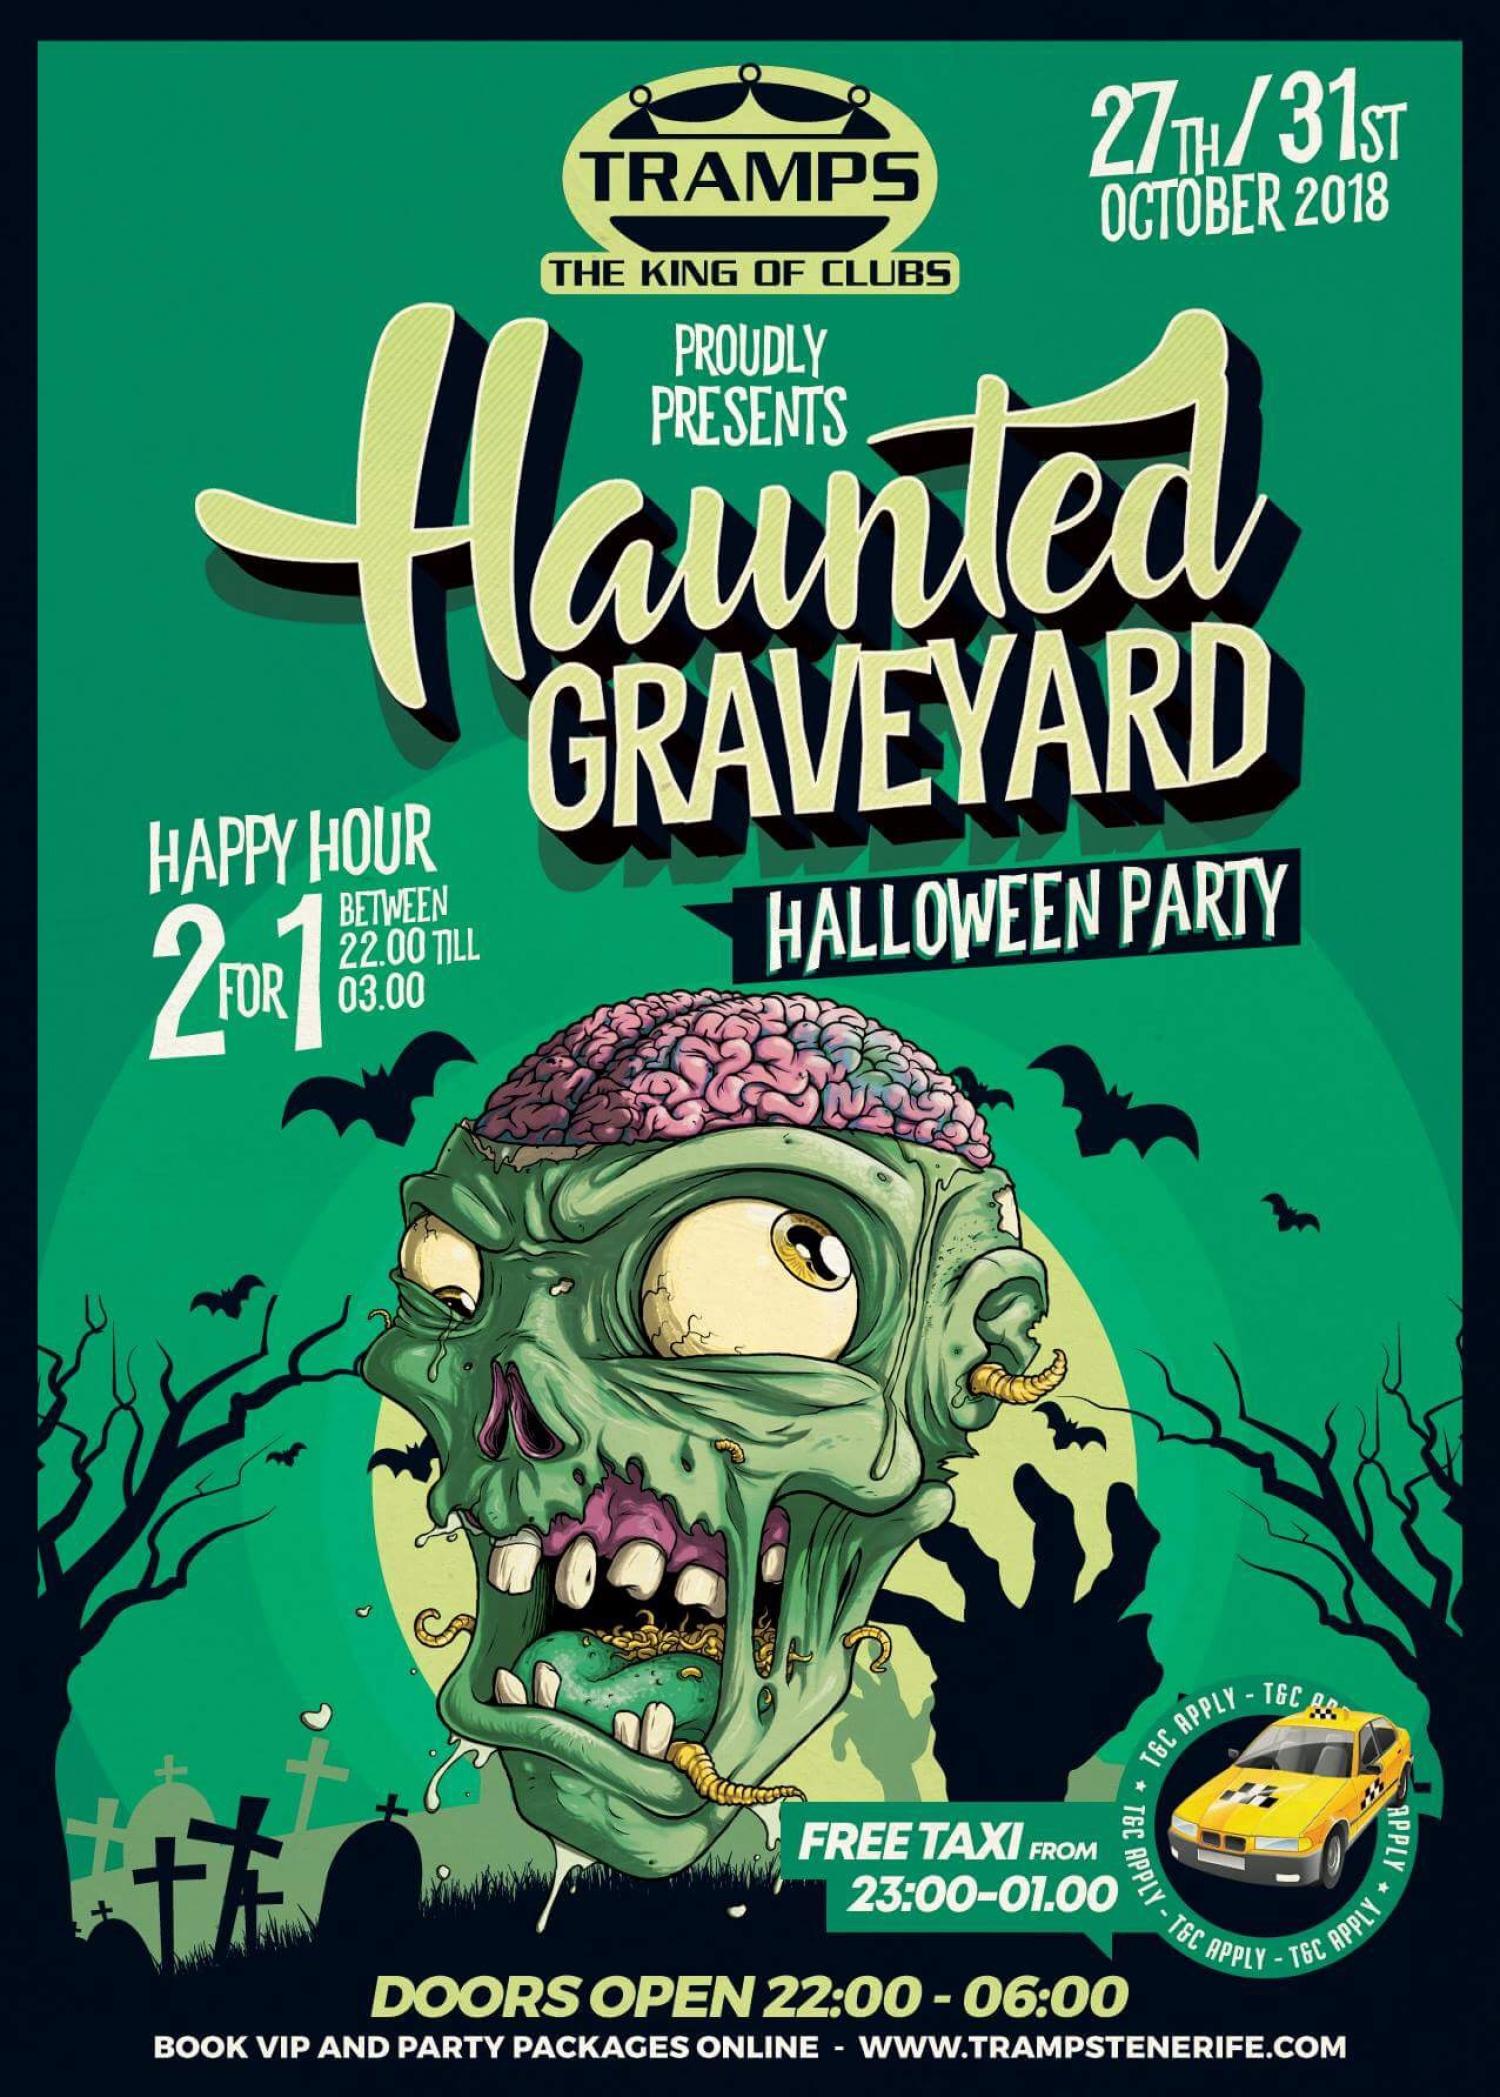 Haunted Graveyard Halloween Party